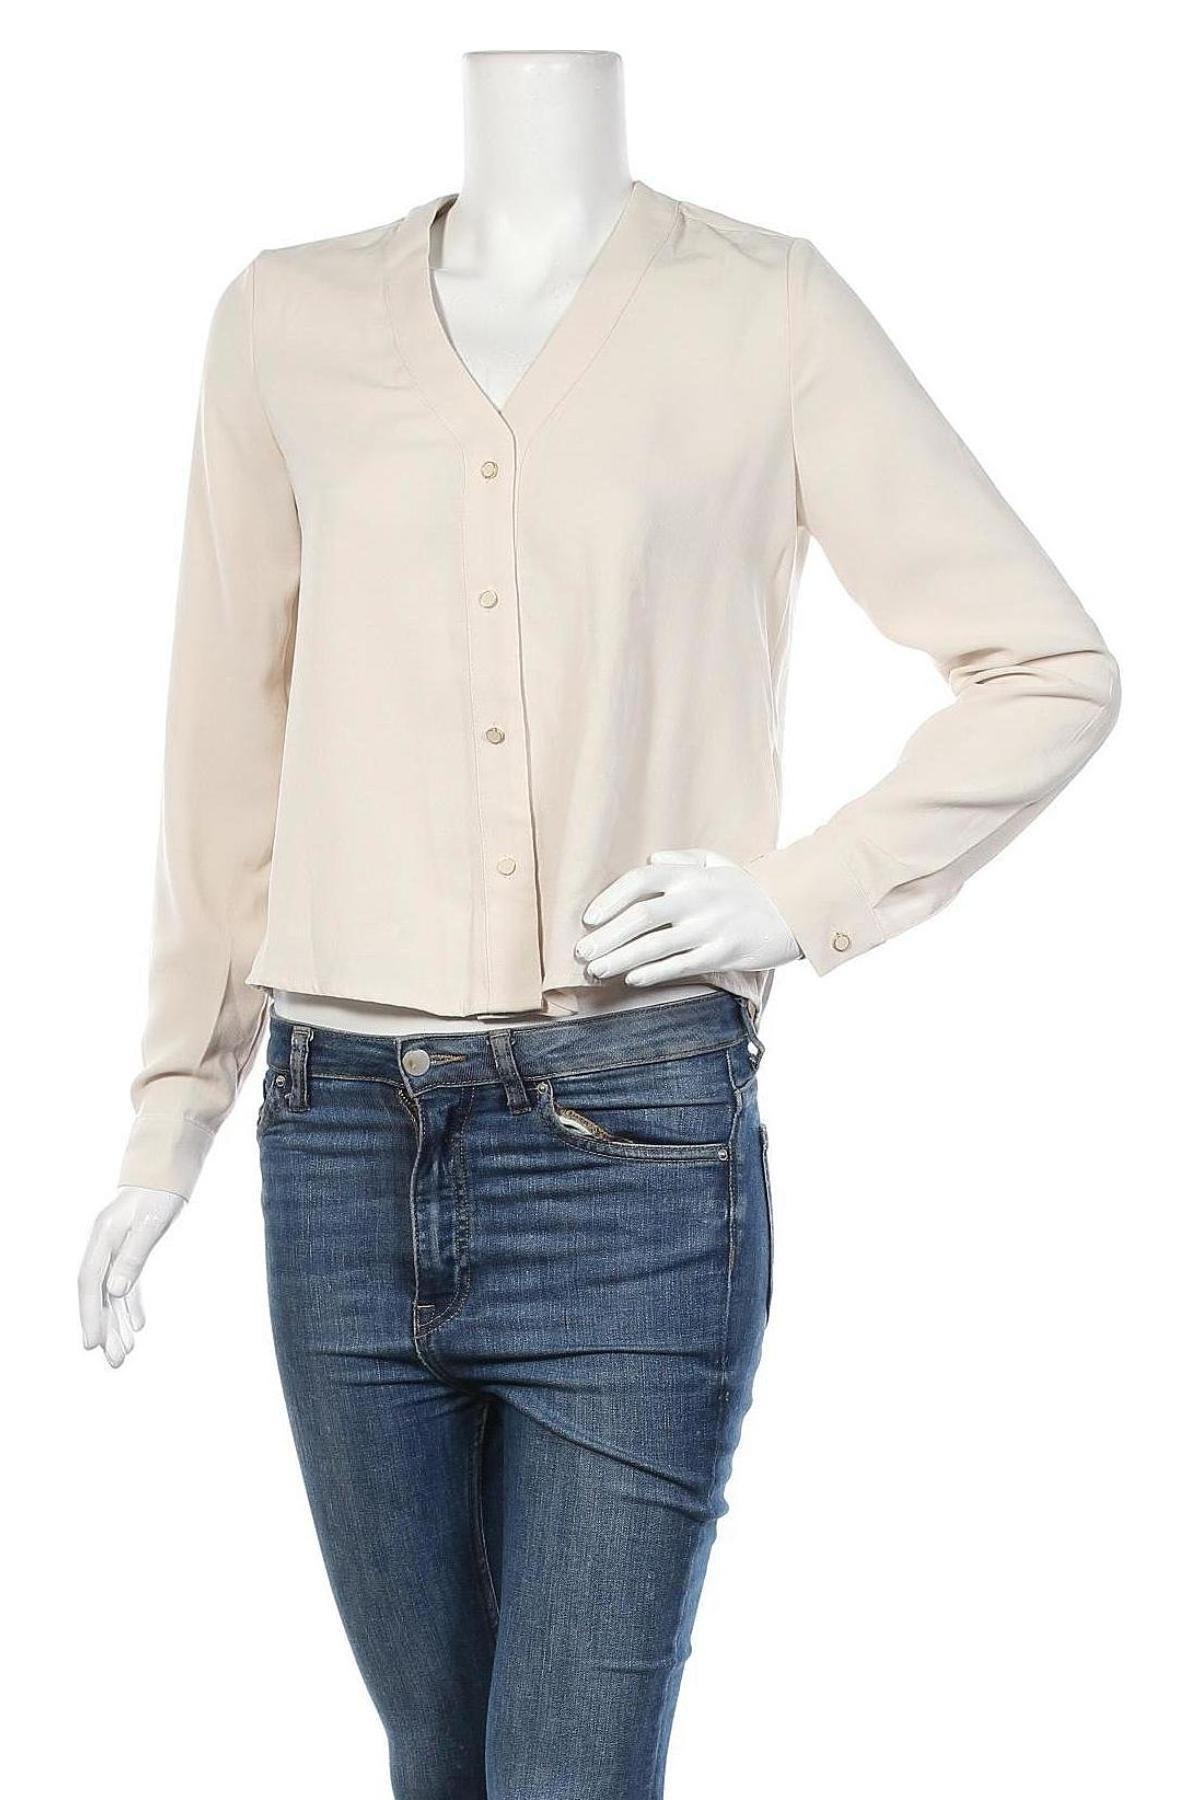 Дамска риза Camaieu, Размер XS, Цвят Бежов, Полиестер, Цена 12,88лв.